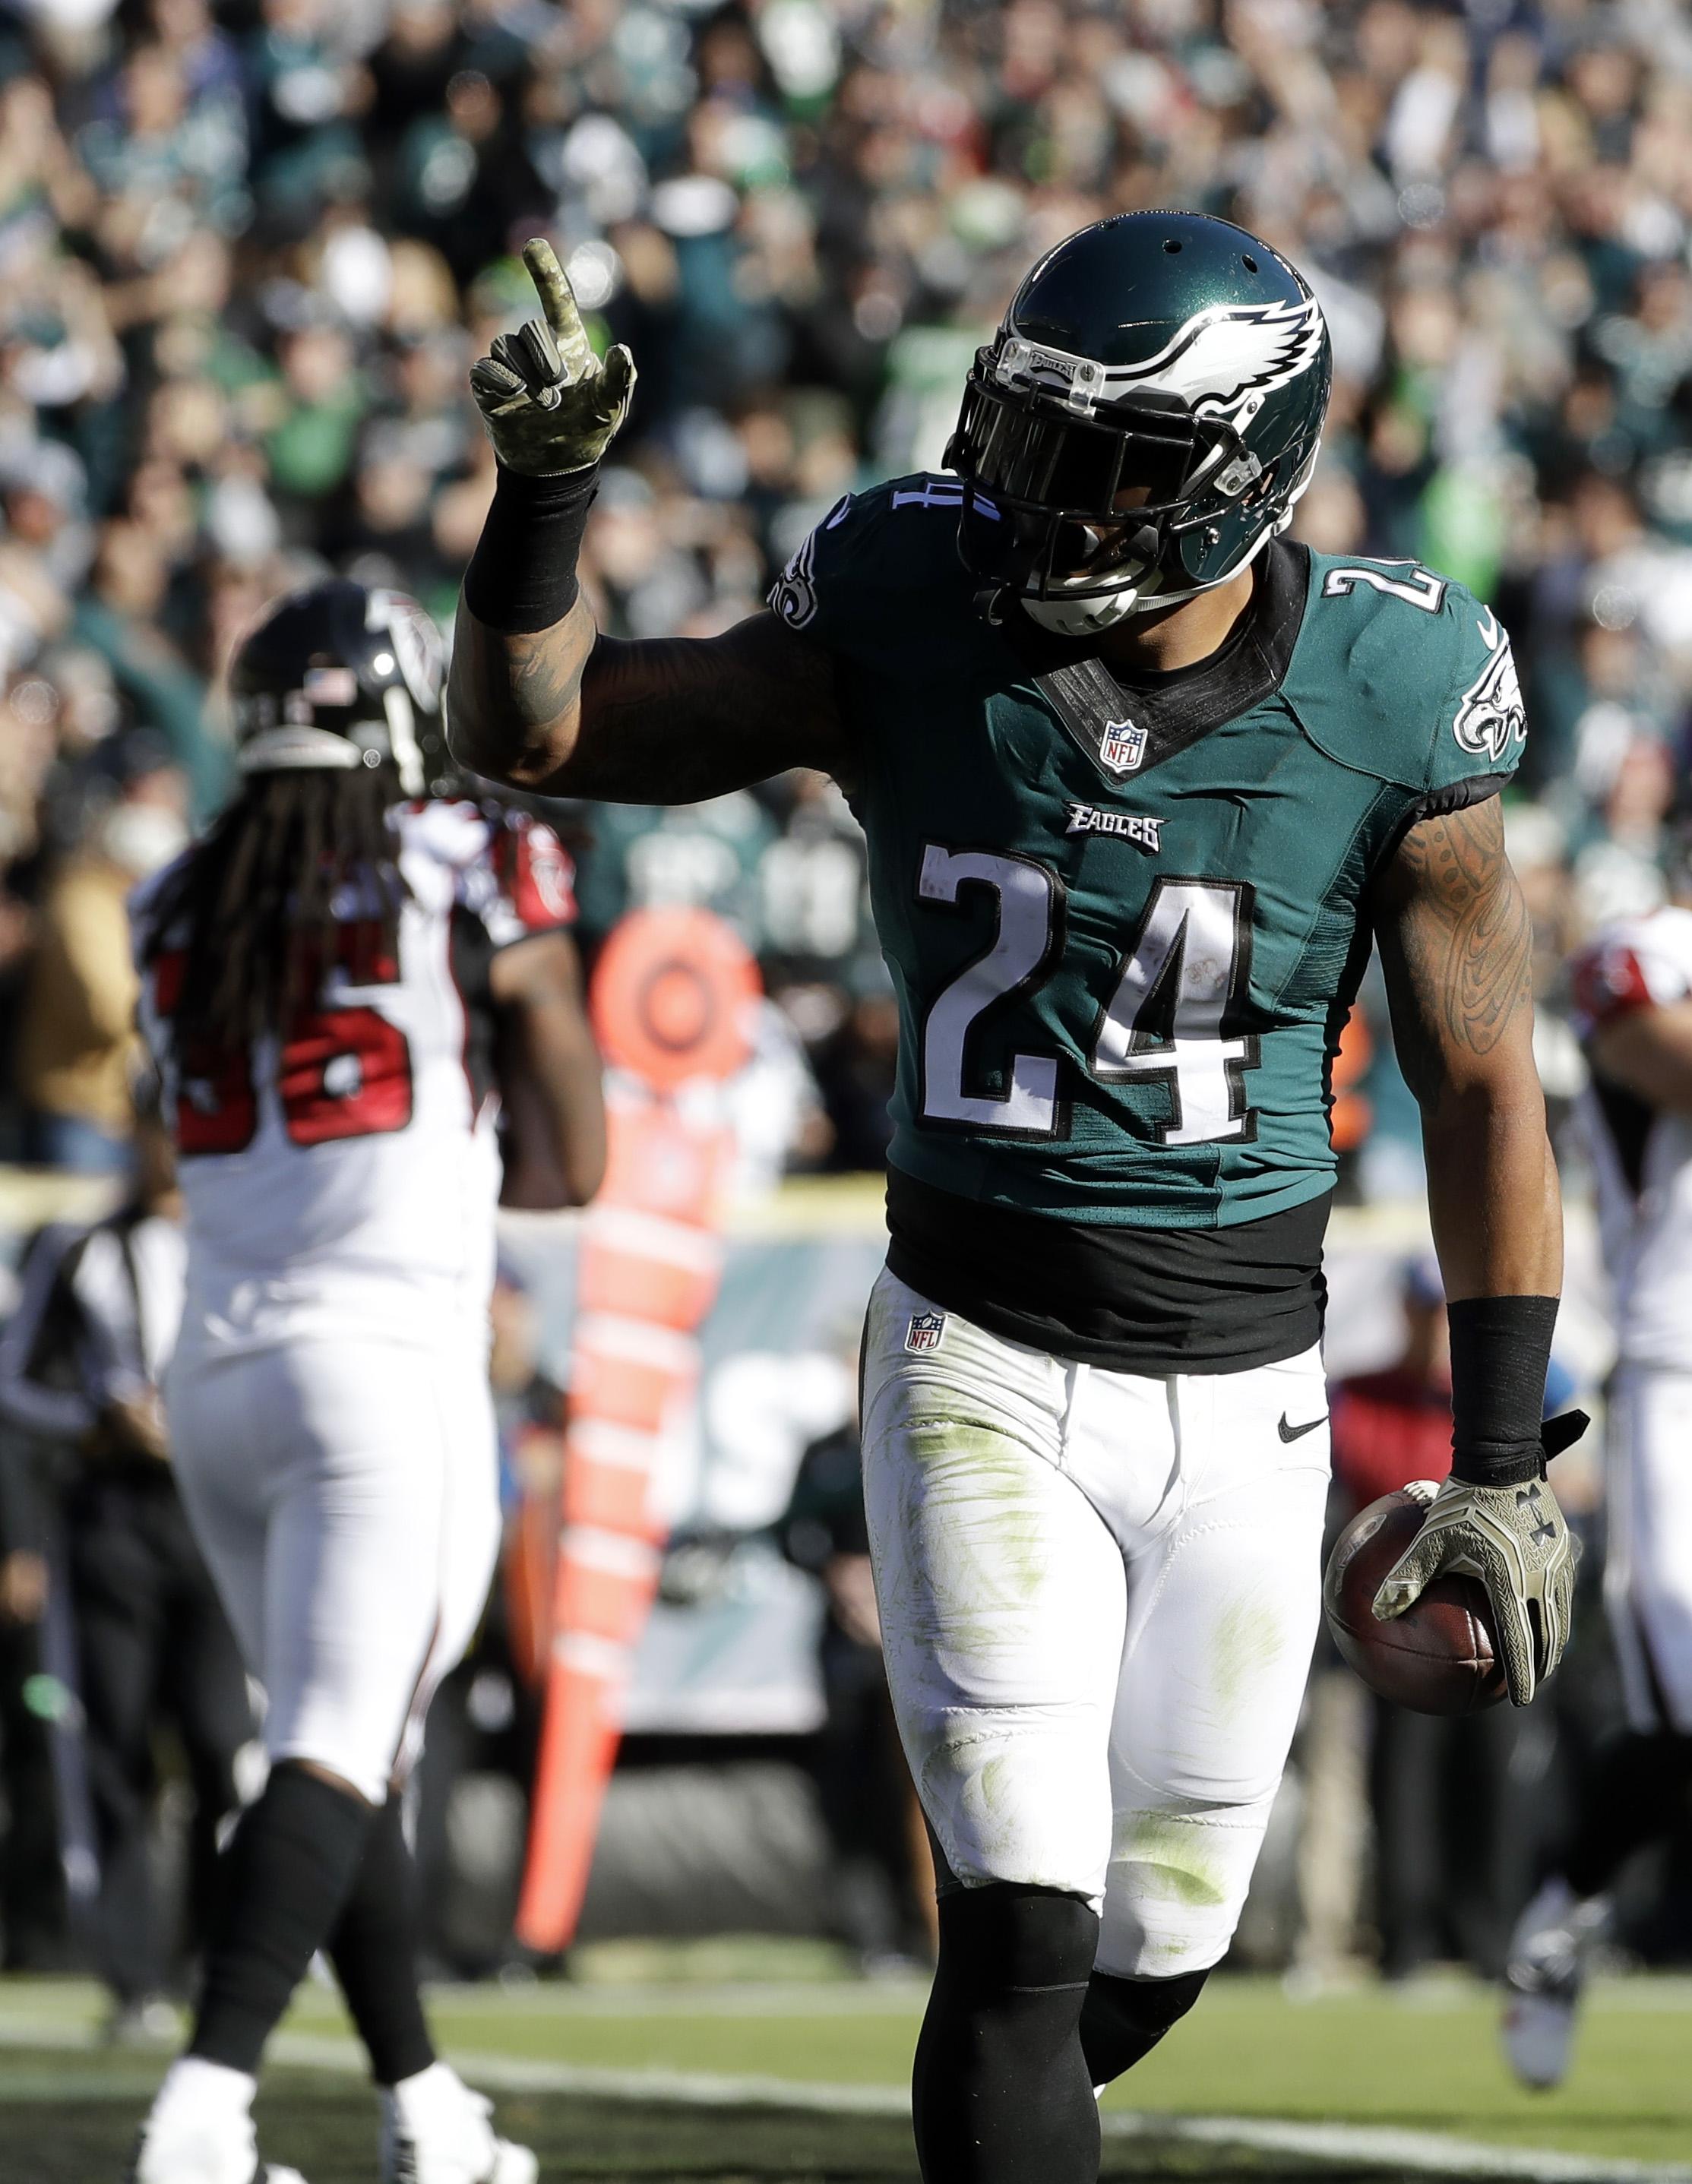 Philadelphia Eagles' Ryan Mathews celebrates a touchdown run during the first half of an NFL football game against the Atlanta Falcons, Sunday, Nov. 13, 2016, in Philadelphia. (AP Photo/Matt Slocum)